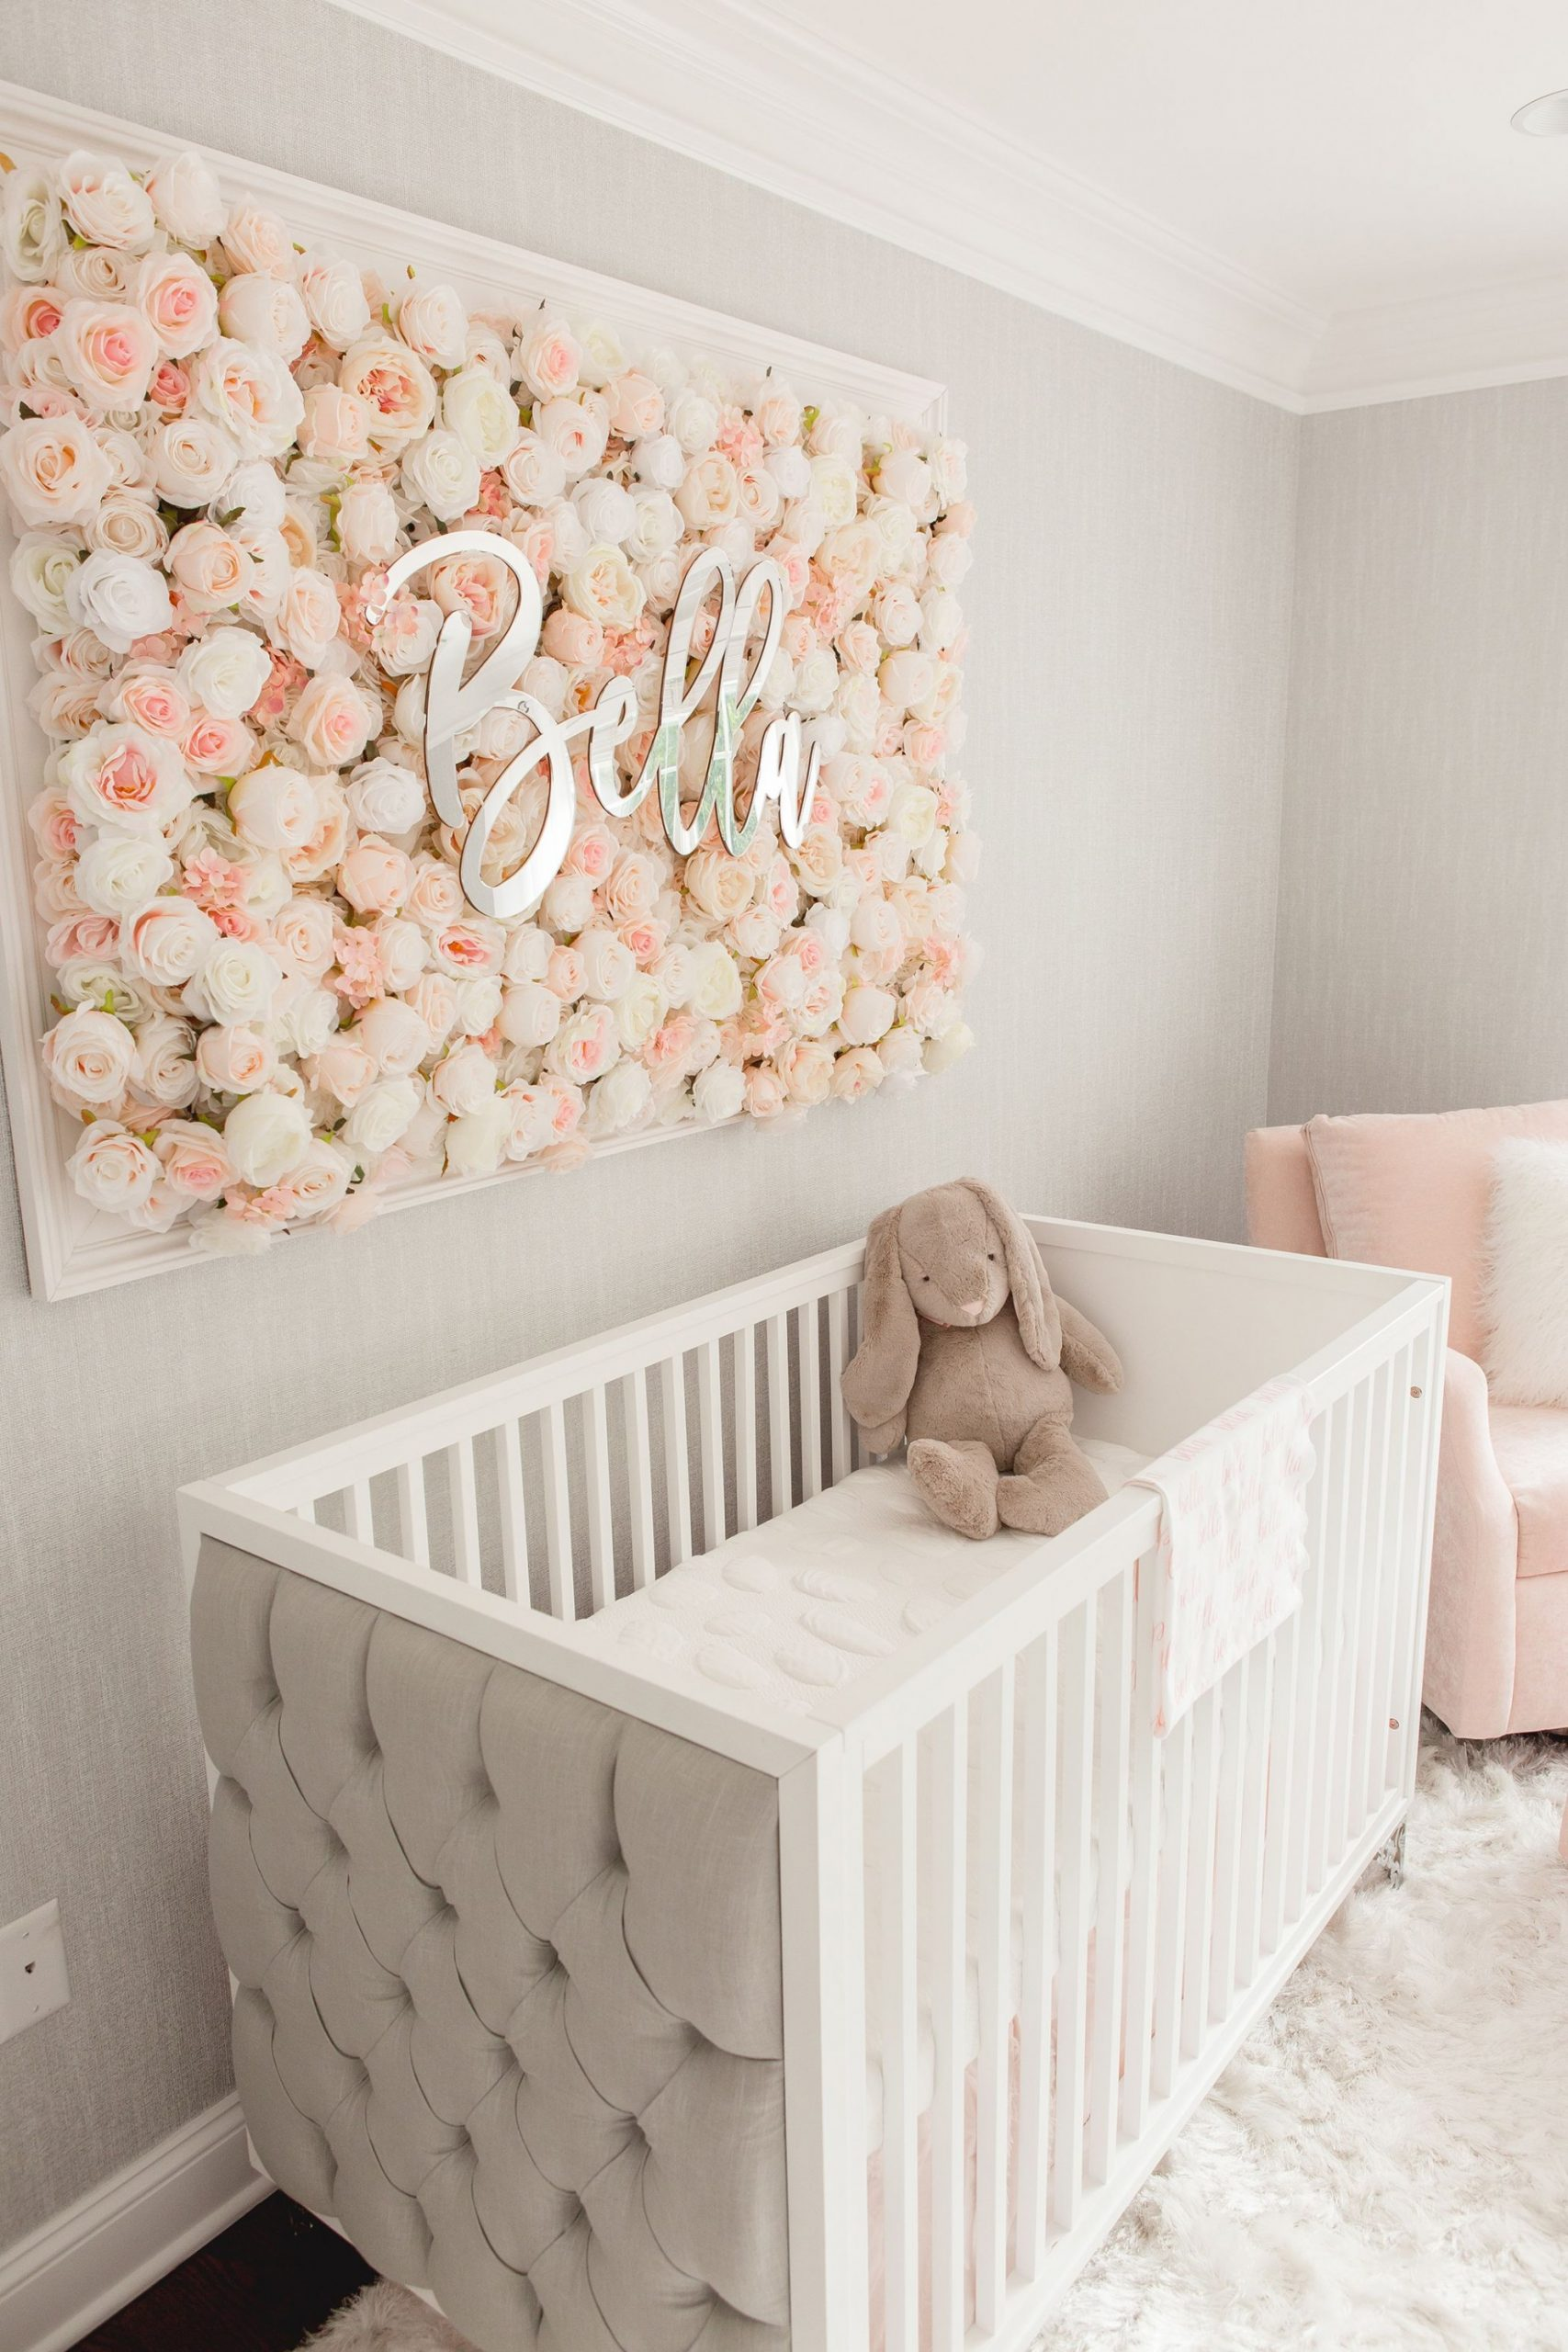 Pin on Baby Girl Nursery Ideas - Wall Decor Ideas Baby Room